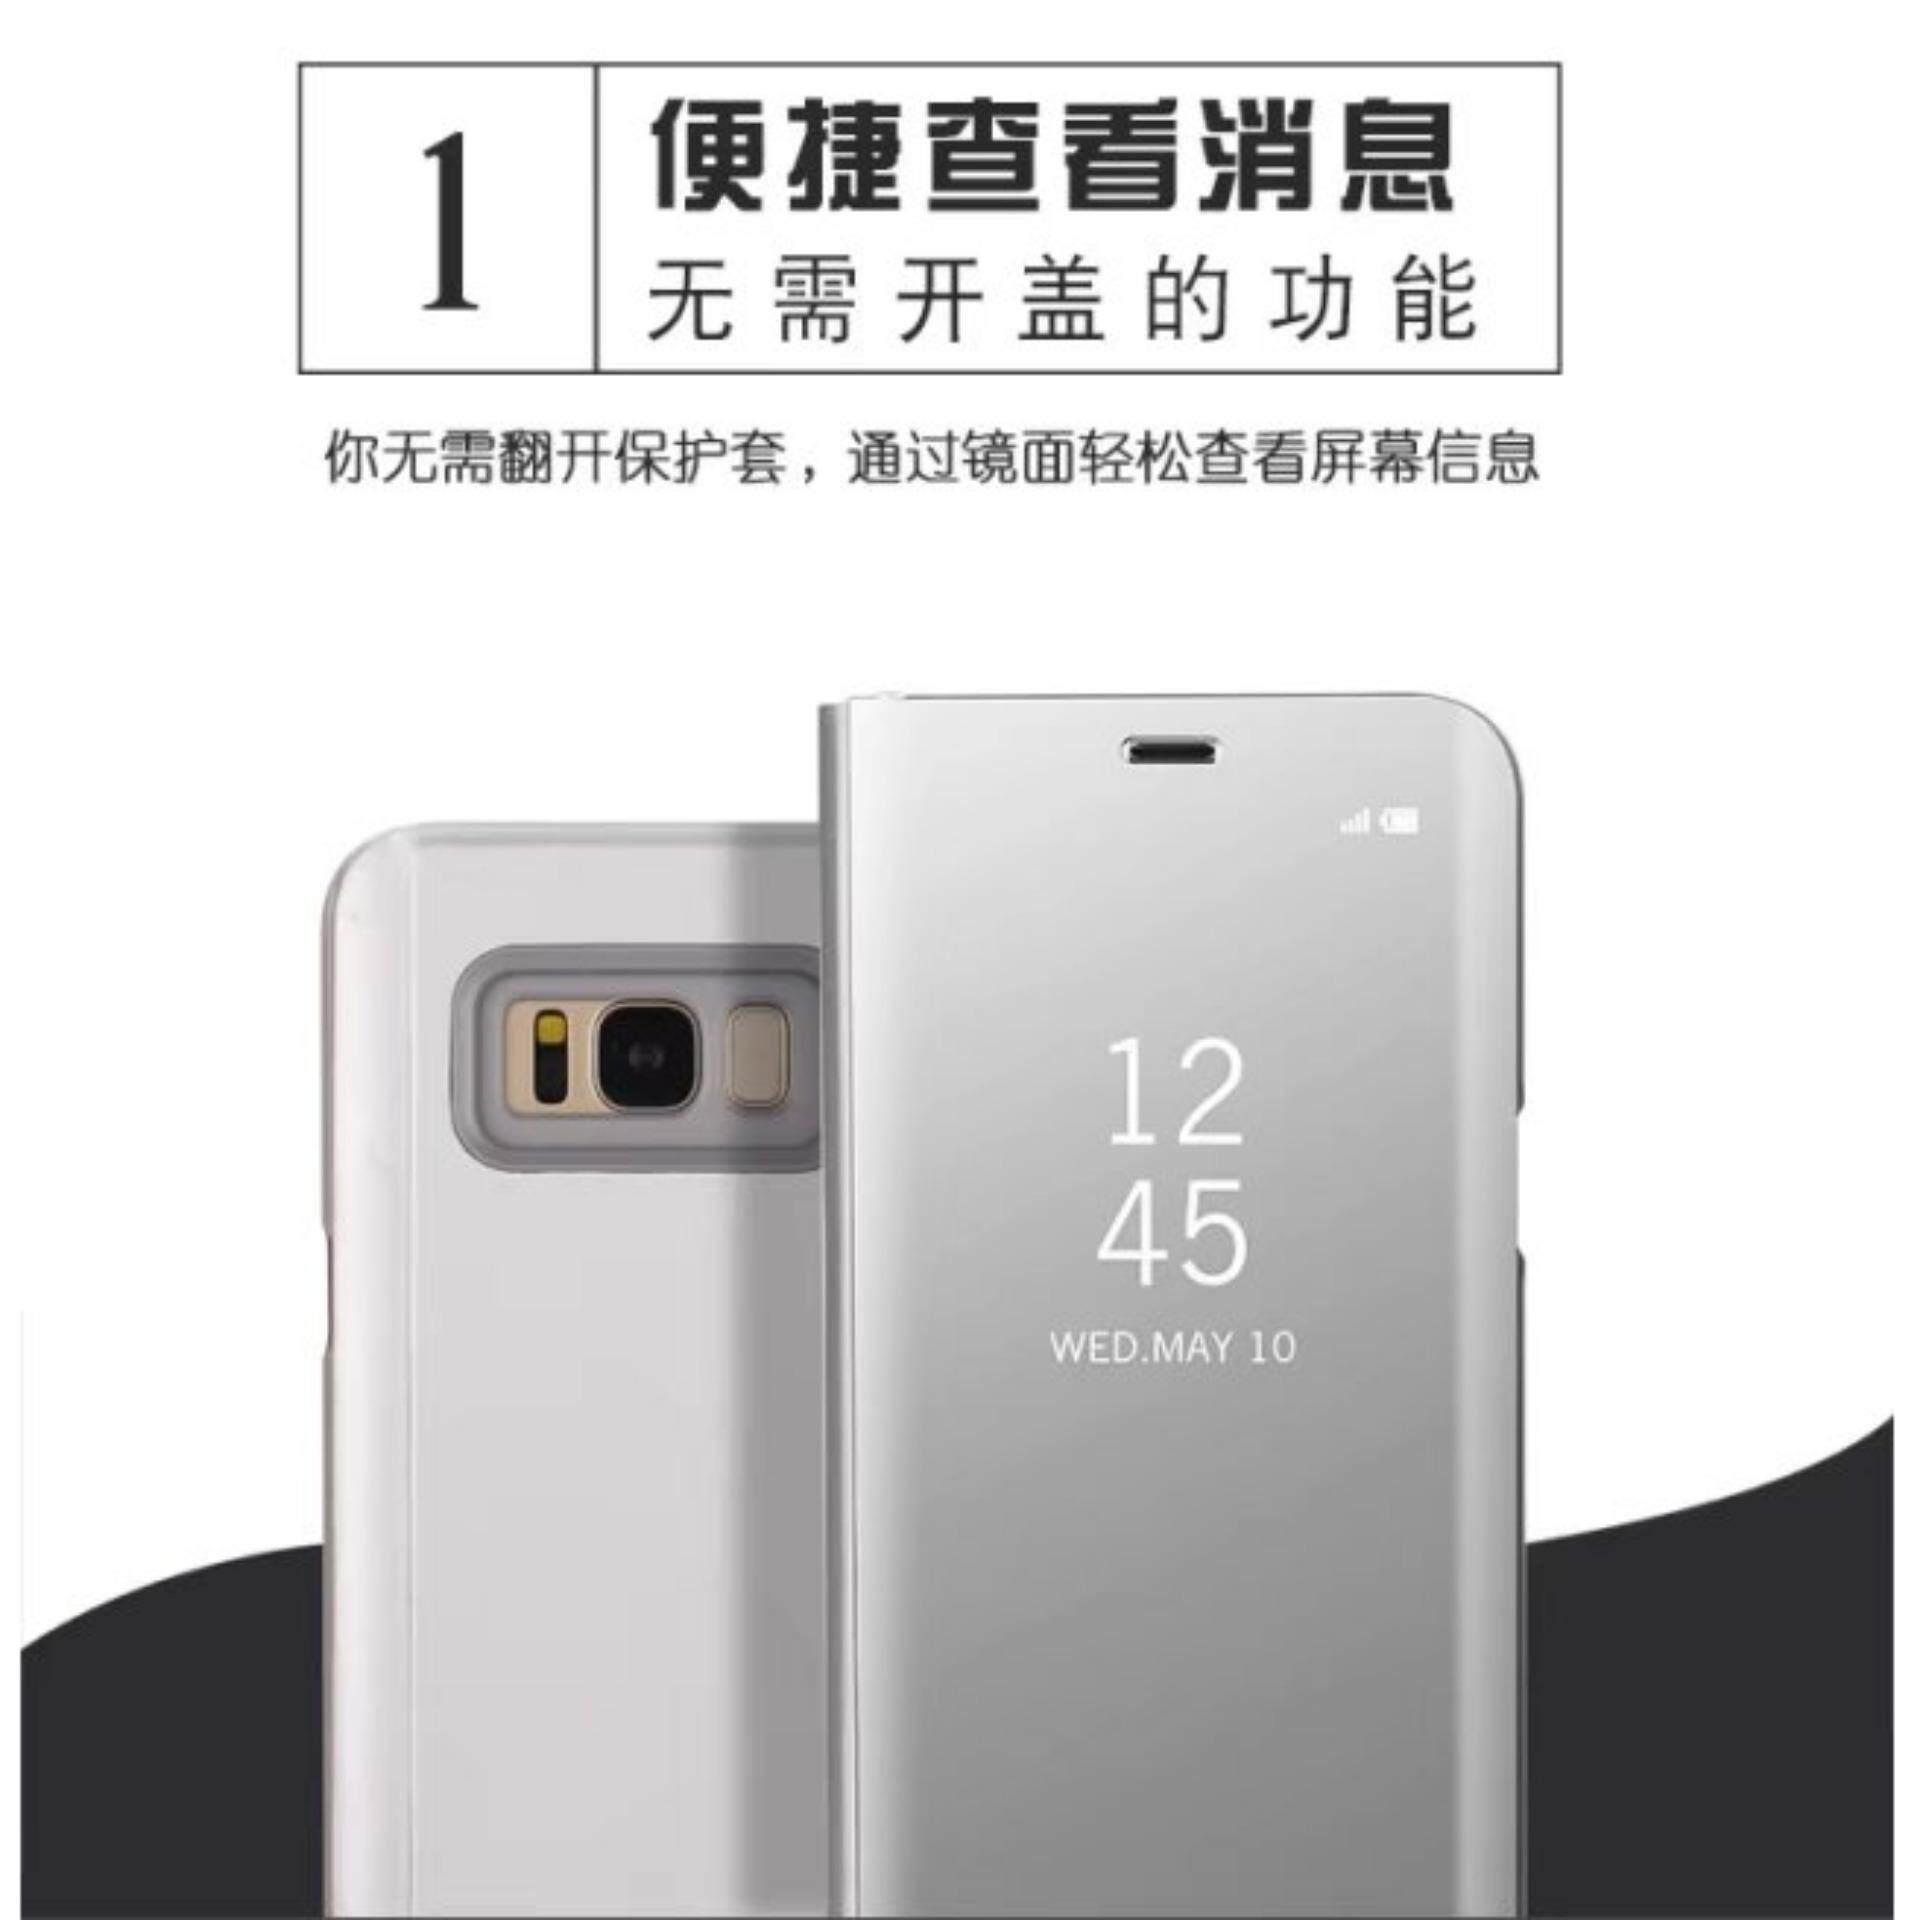 Fitur For Samsung Galaxy S8 G950 Flip View Plating Mirror Clear Original Cover Casing Plus Biru Detail Gambar Leather Stand Holder Hand Case Intl Terbaru